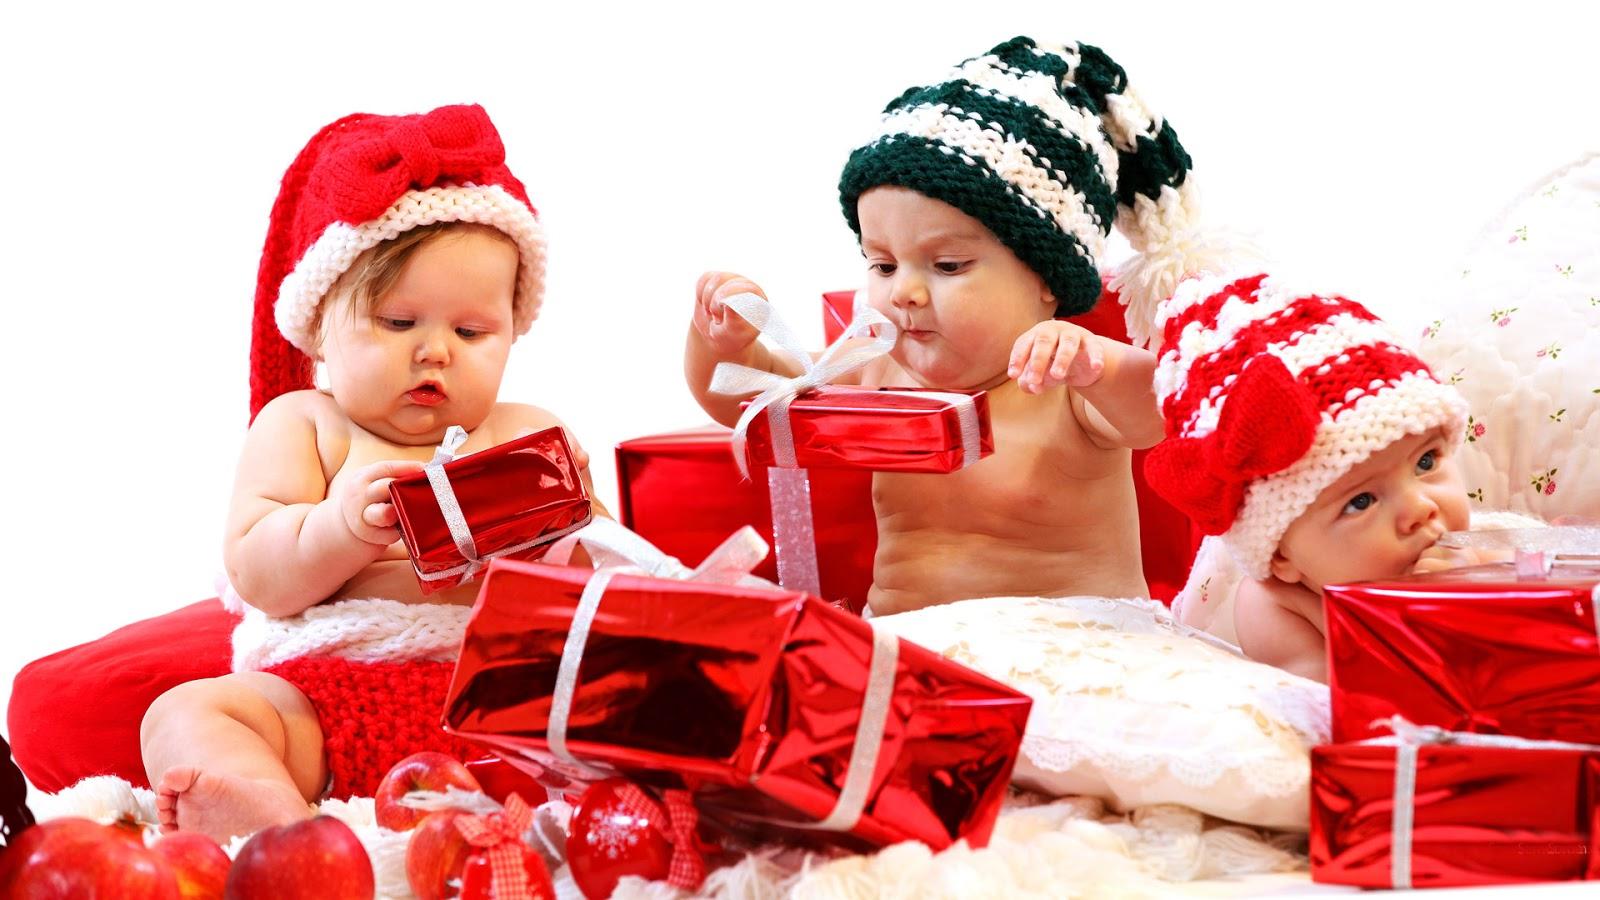 Christmas Baby Images Hd.Christmas Baby Wallpaper Hd Wallpapers New Asimbabalinks